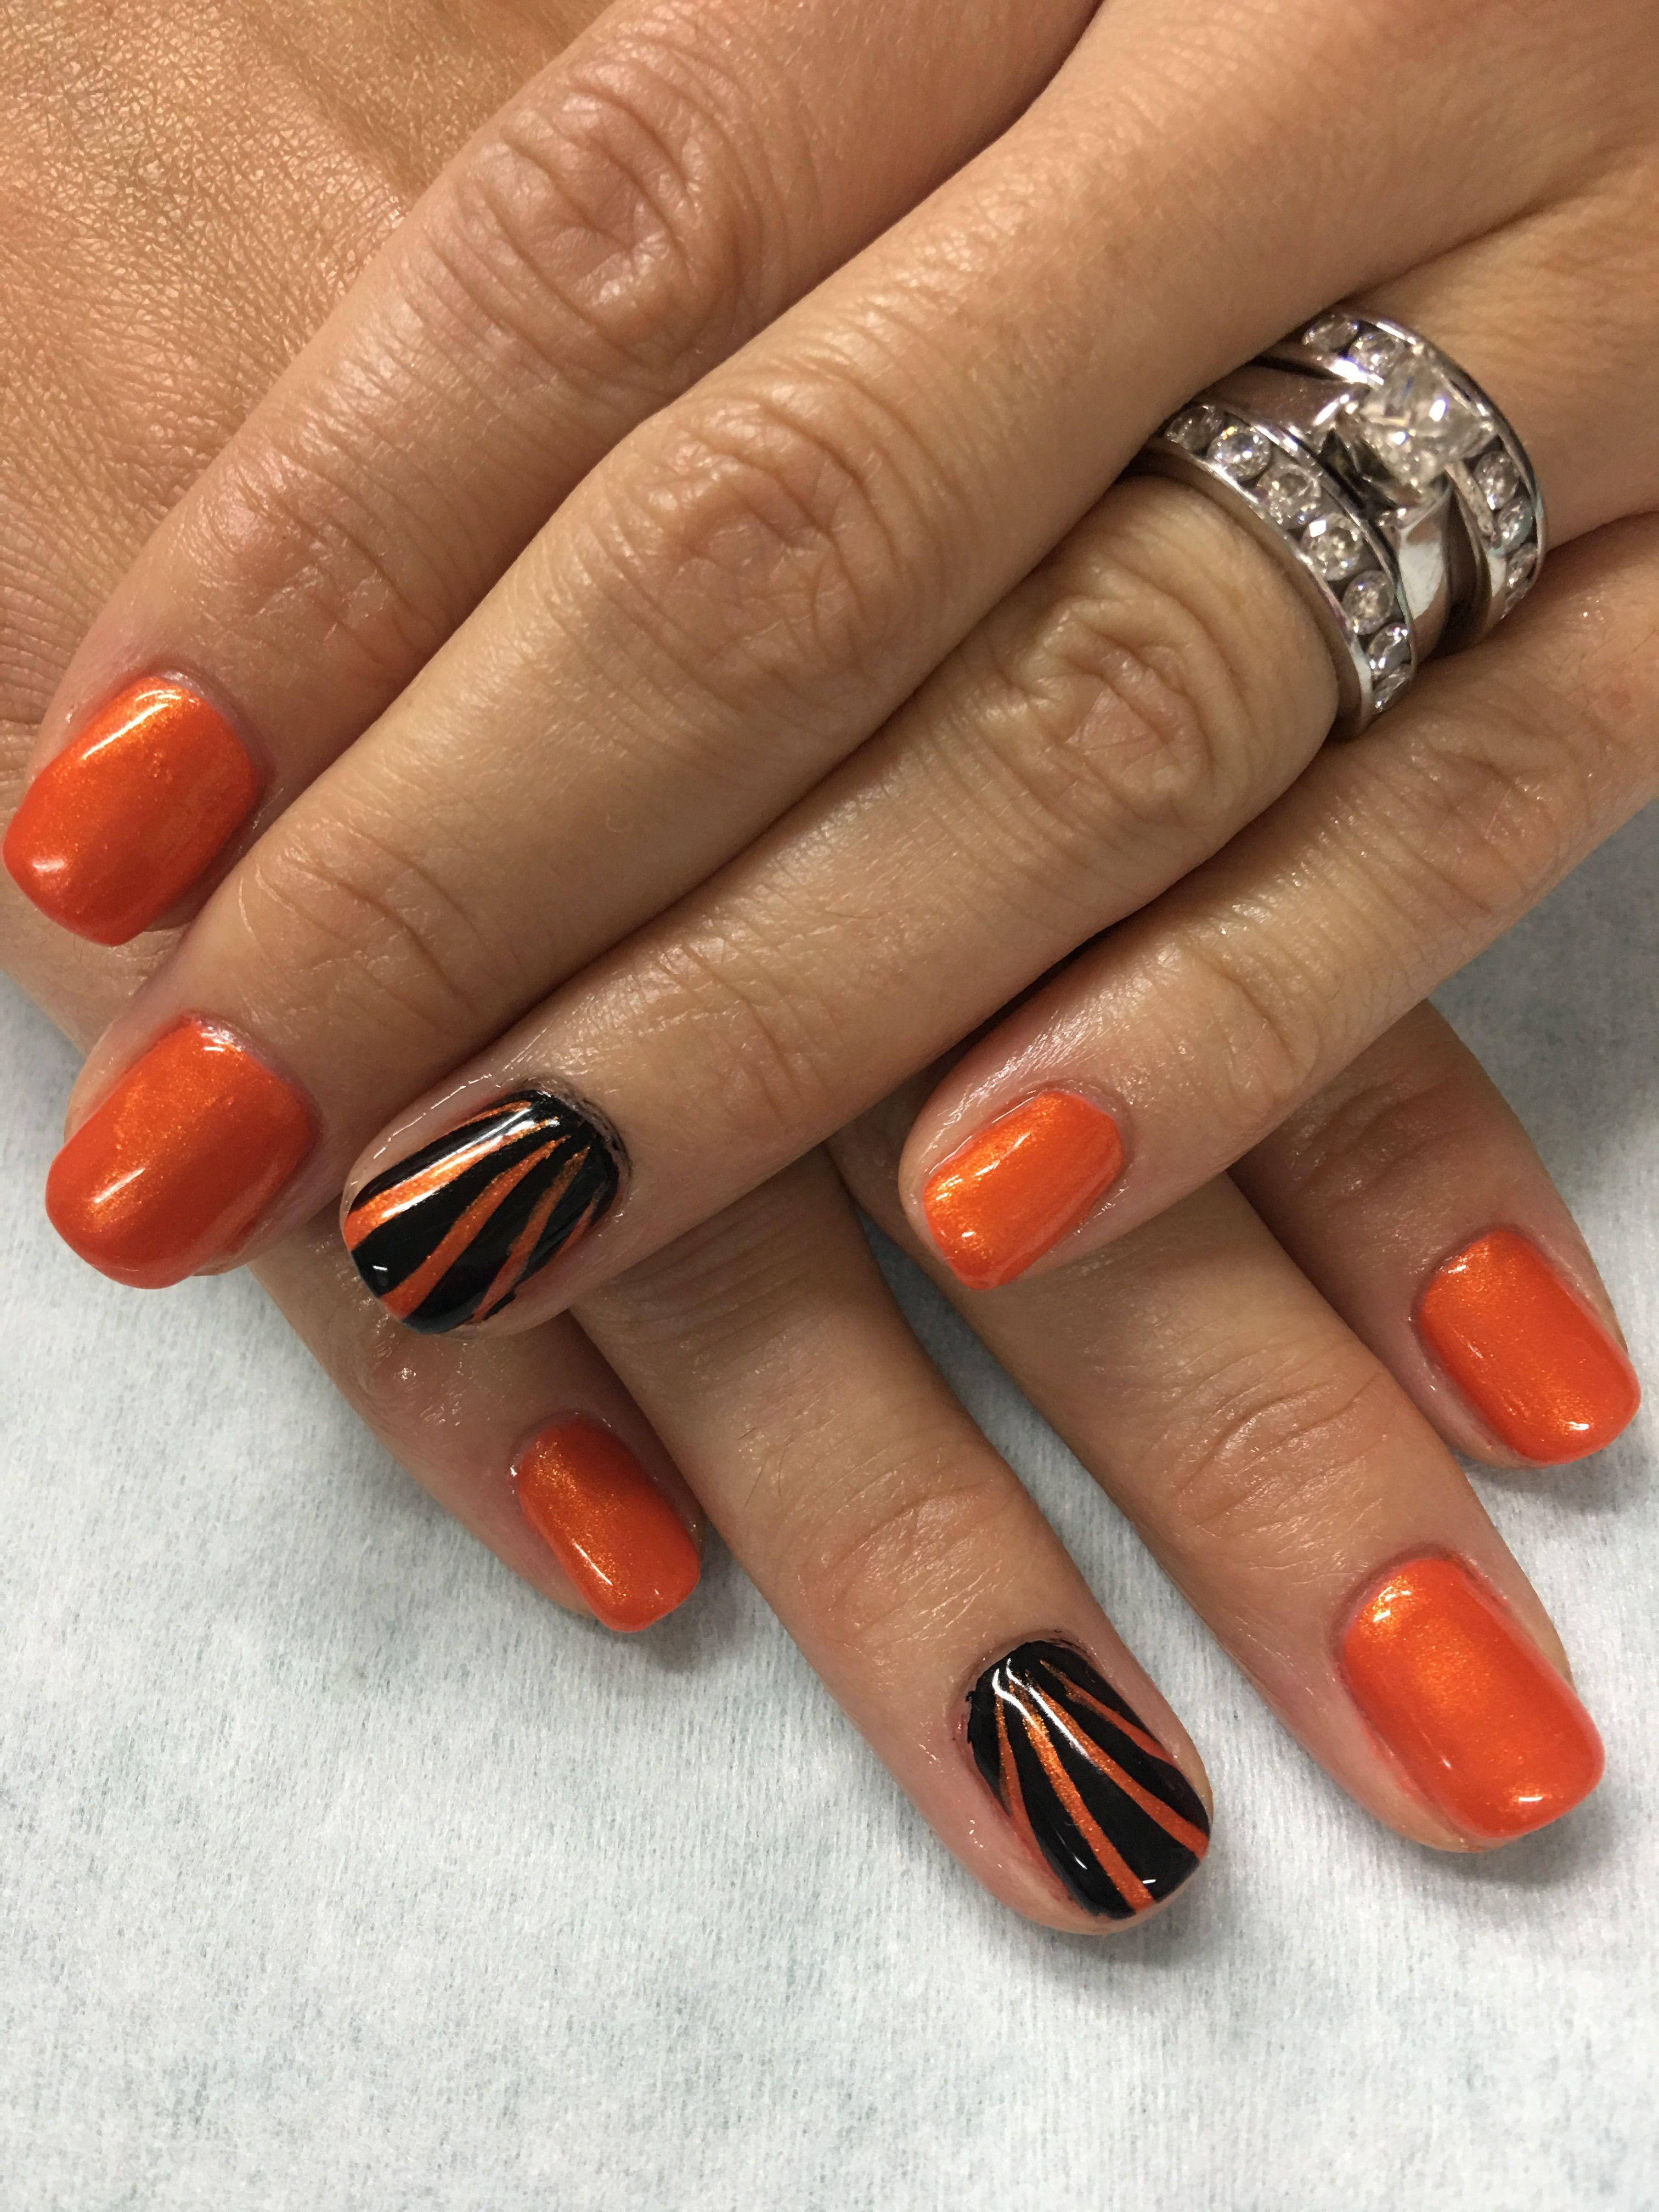 Orange And Black Nail Designs : orange, black, designs, Orange, Black, Stripe, Halloween, Nails, Designs,